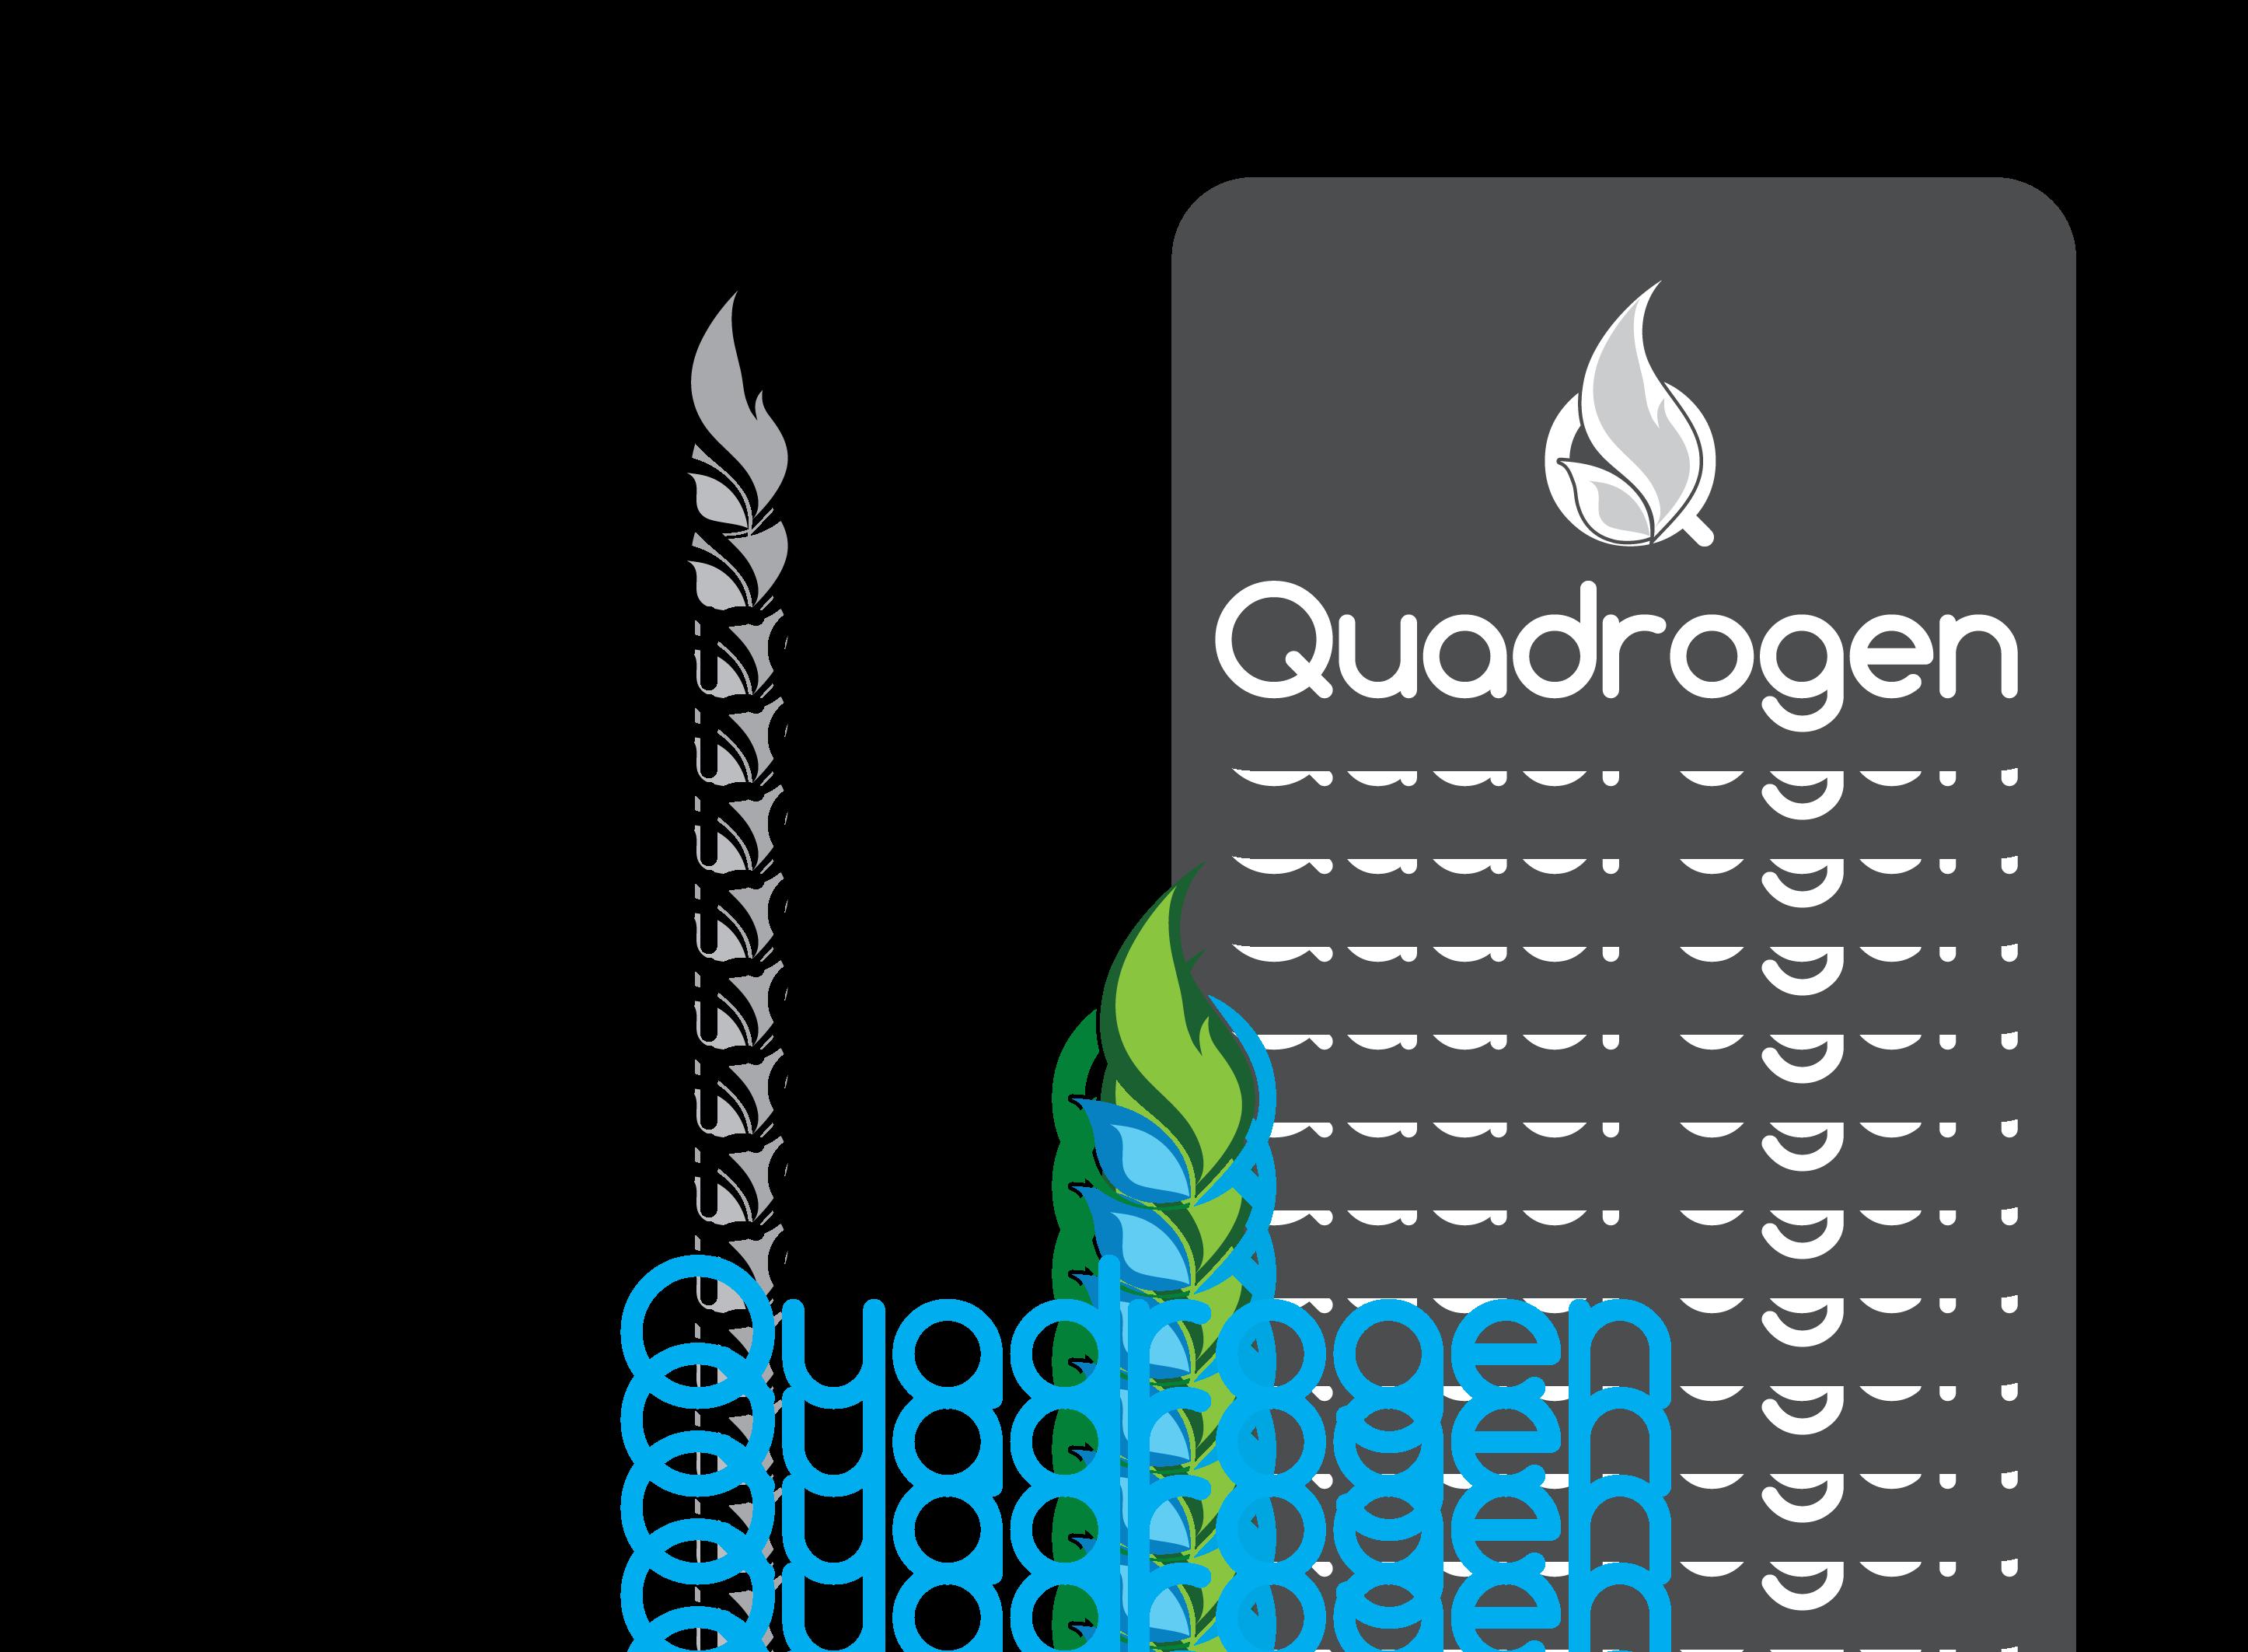 Logo Design by 354studio - Entry No. 152 in the Logo Design Contest New Logo Design for Quadrogen Power Systems, Inc.